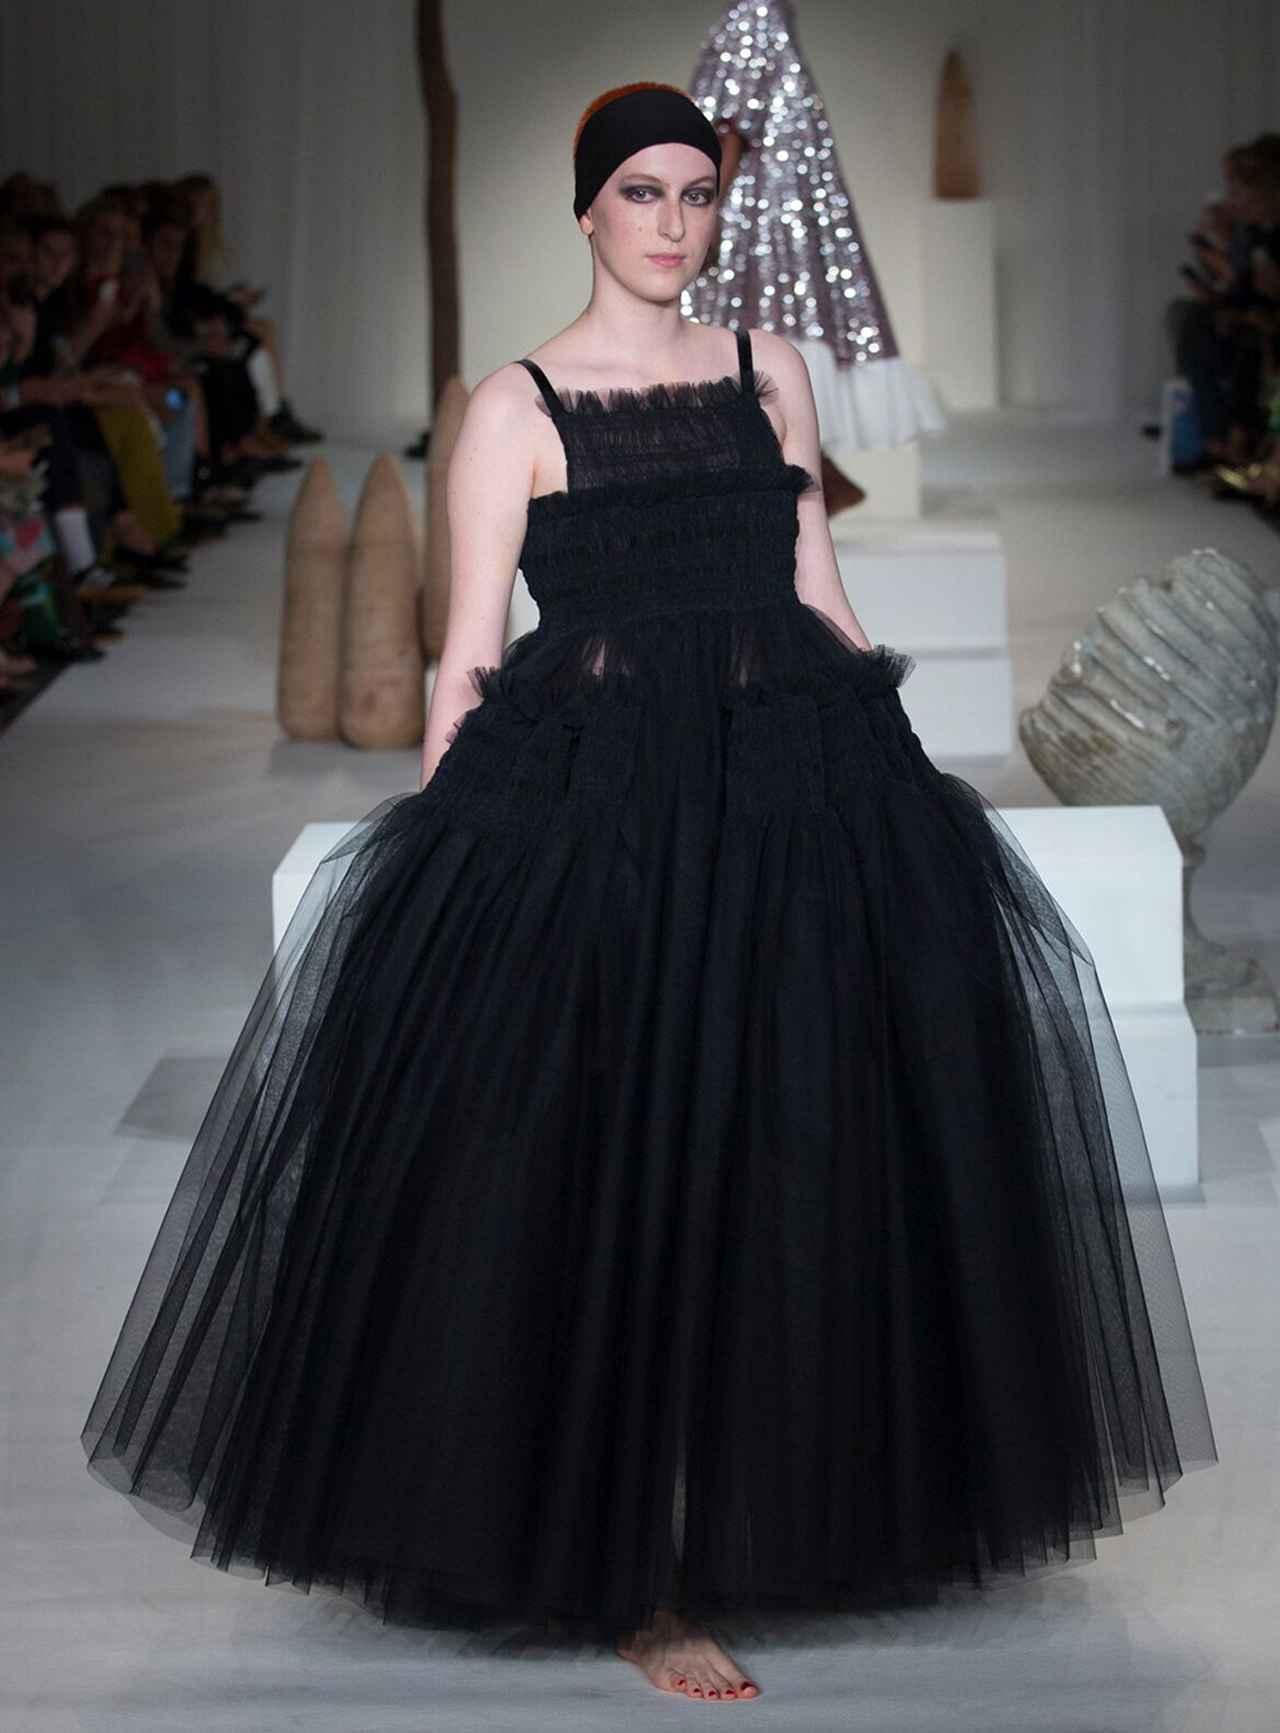 Images : 2番目の画像 - 「ドレス自由自在<Vol.2> 新しい才能が花盛り。 ニュー・ドレス時代到来」のアルバム - T JAPAN:The New York Times Style Magazine 公式サイト